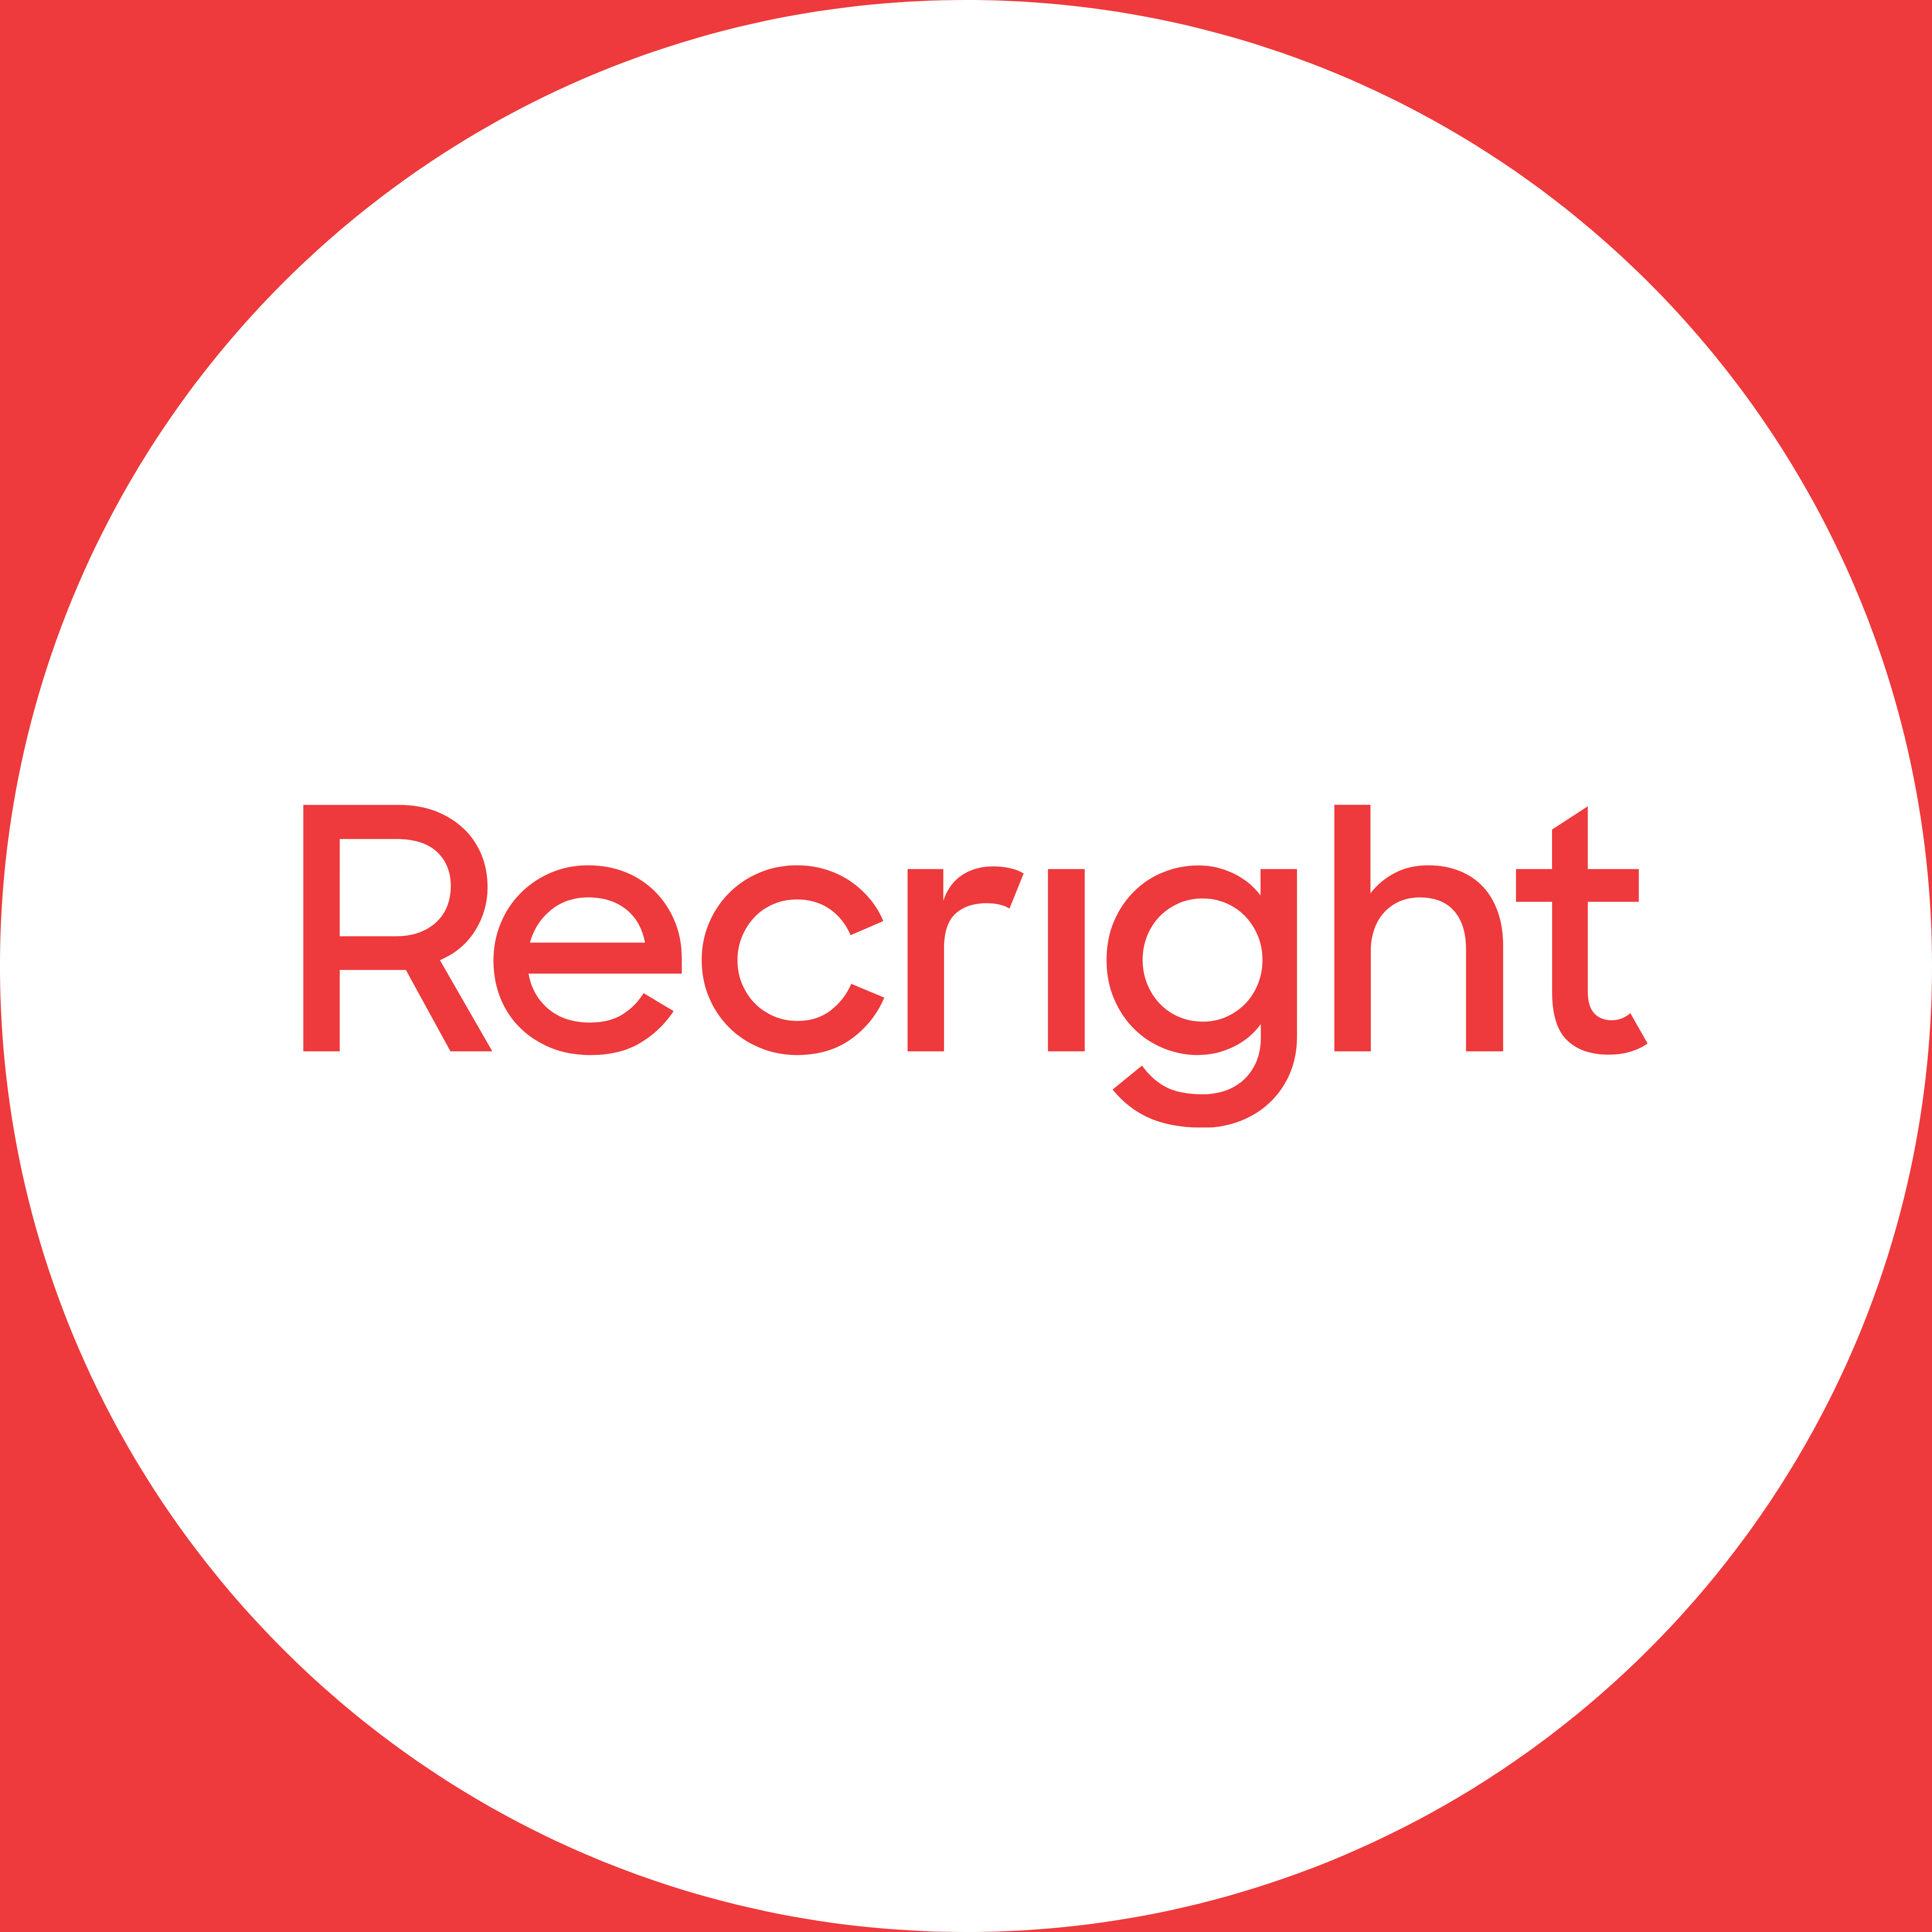 RecRight logo